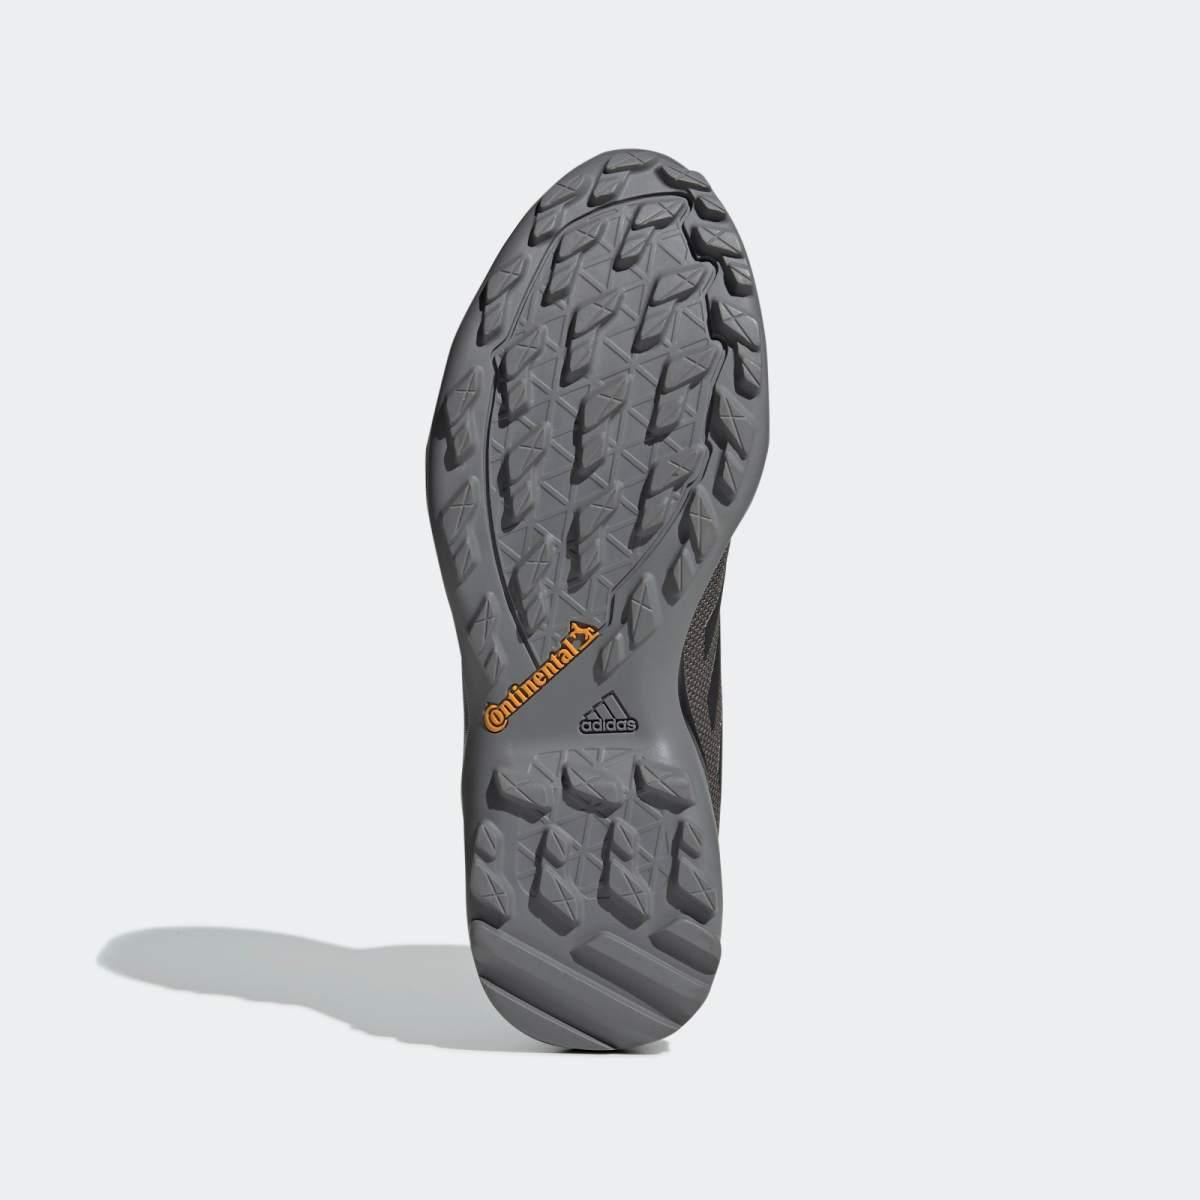 Chaussure_de_randonnee_Terrex_AX3_Mid_GORE-TEX_Gris_BC0468_03_standard